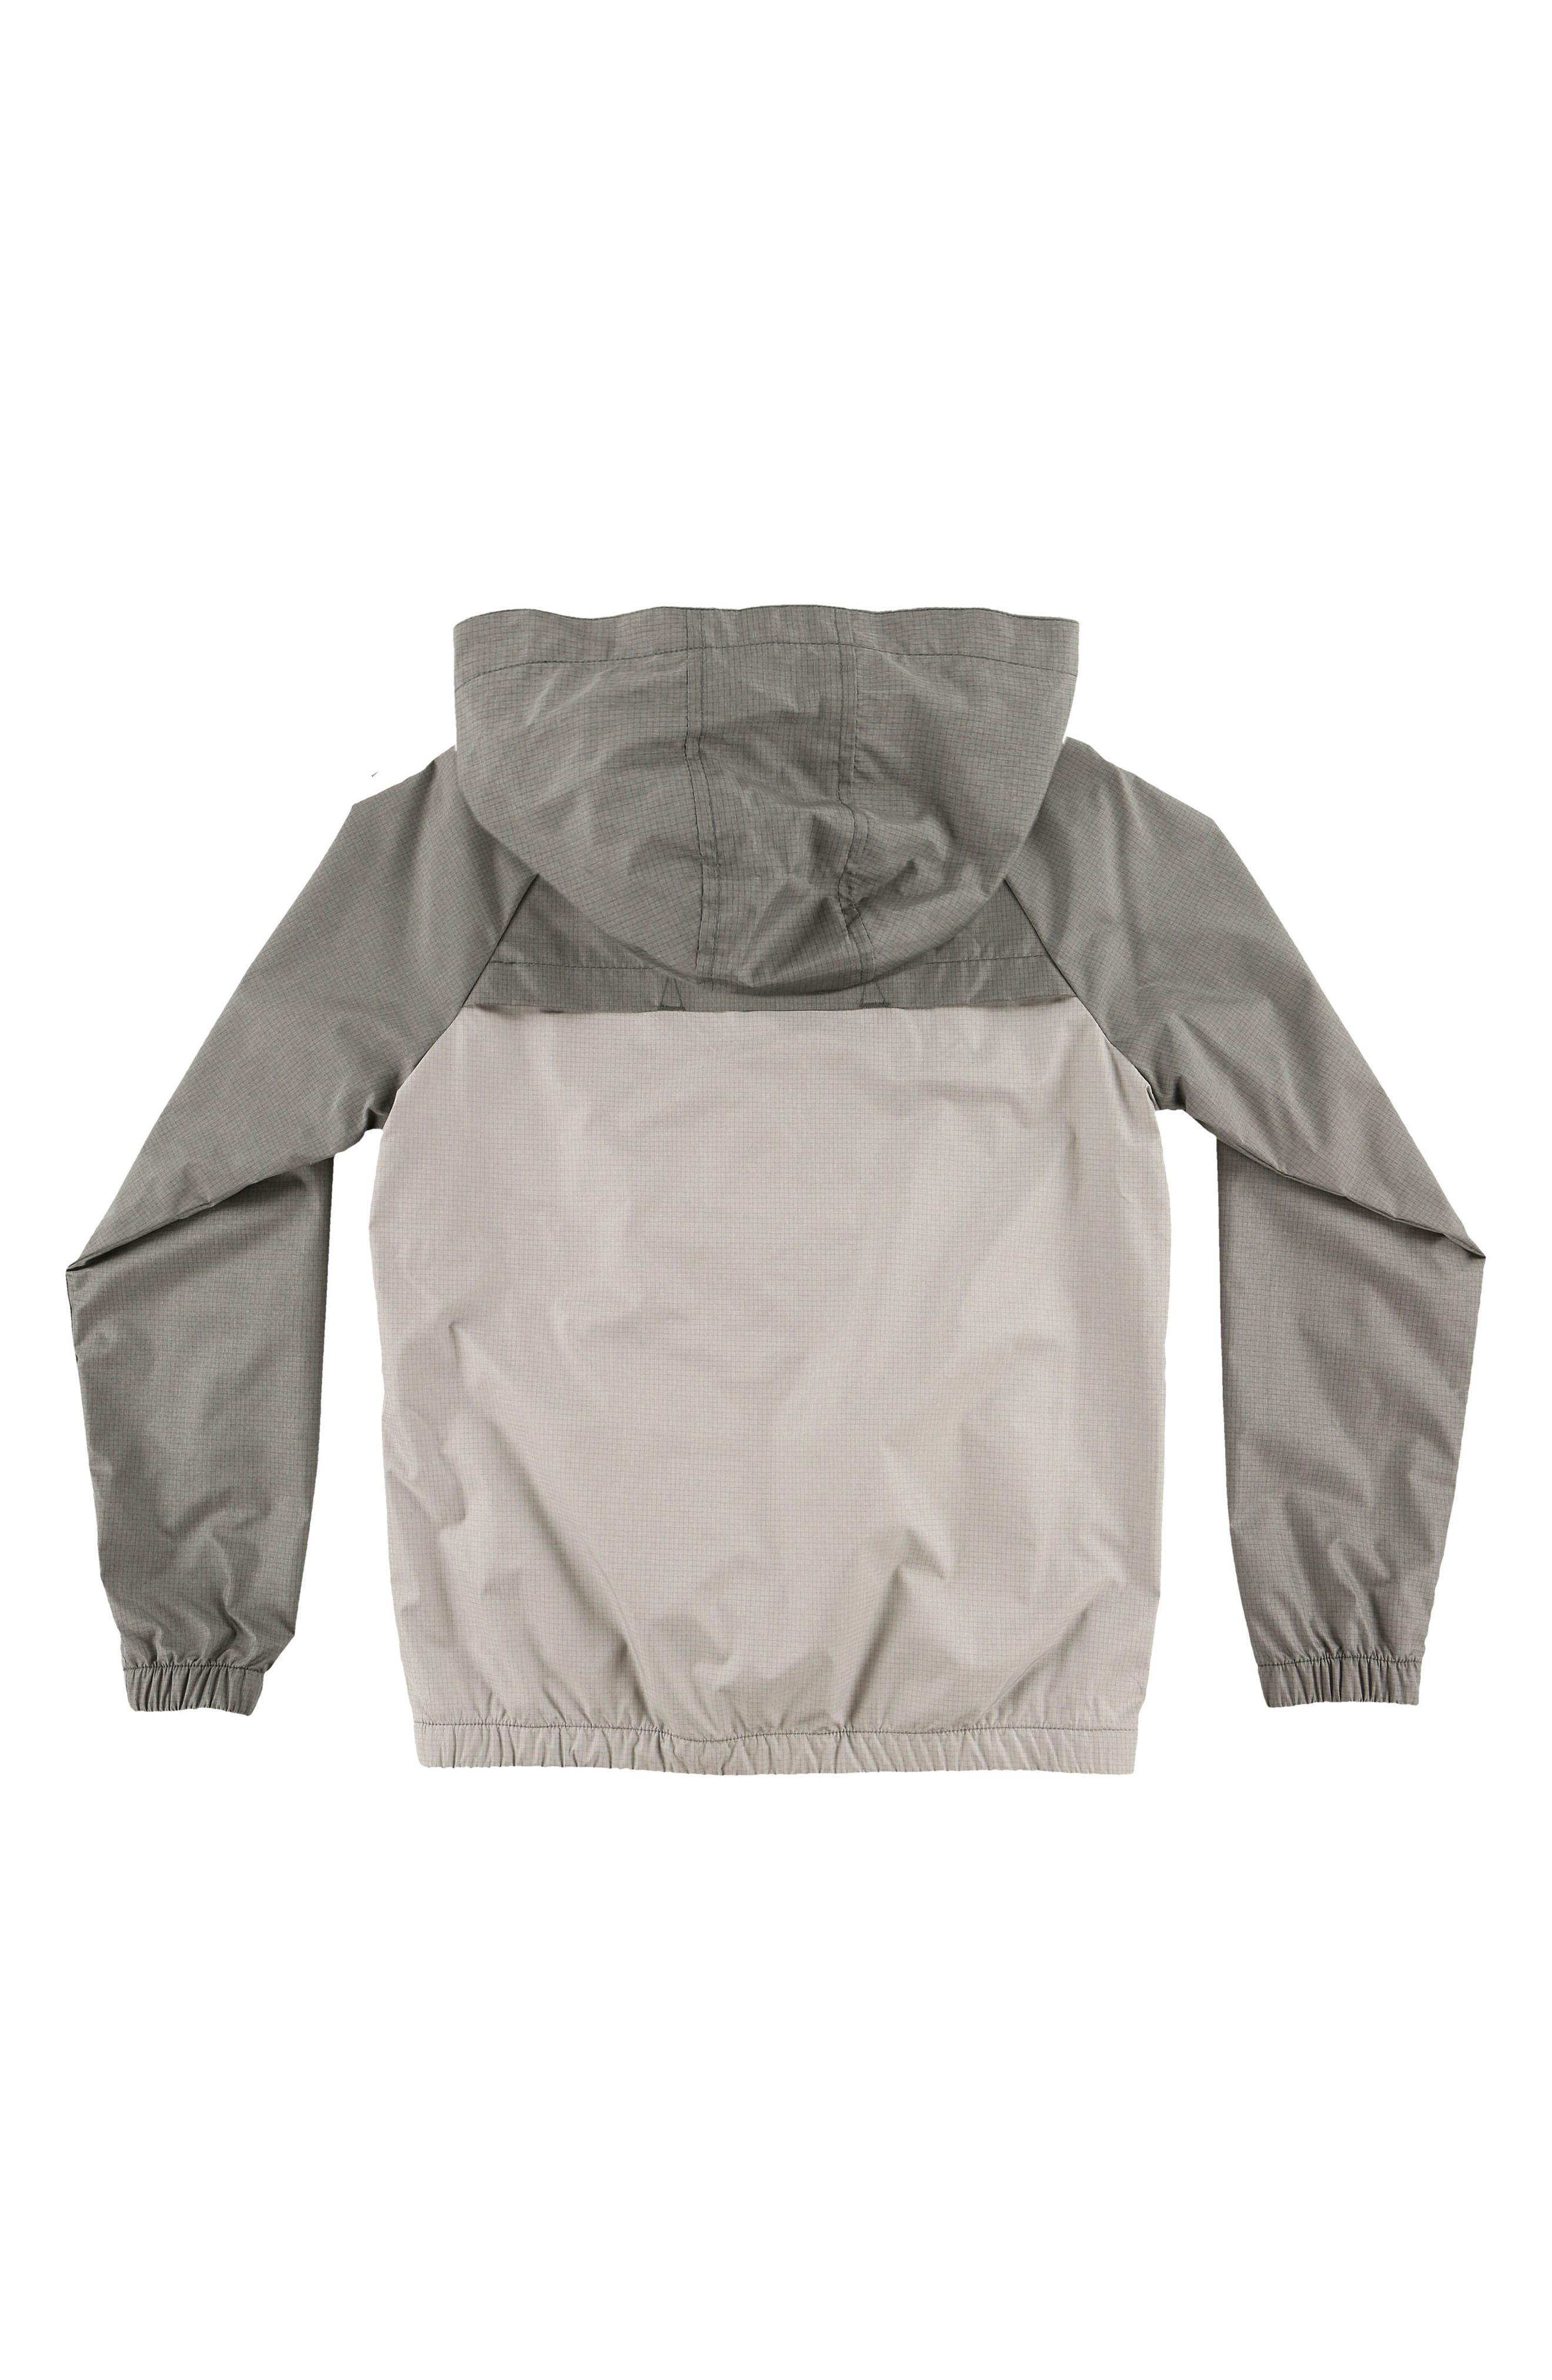 Traveler Packable Windbreaker Jacket,                             Alternate thumbnail 2, color,                             Grey